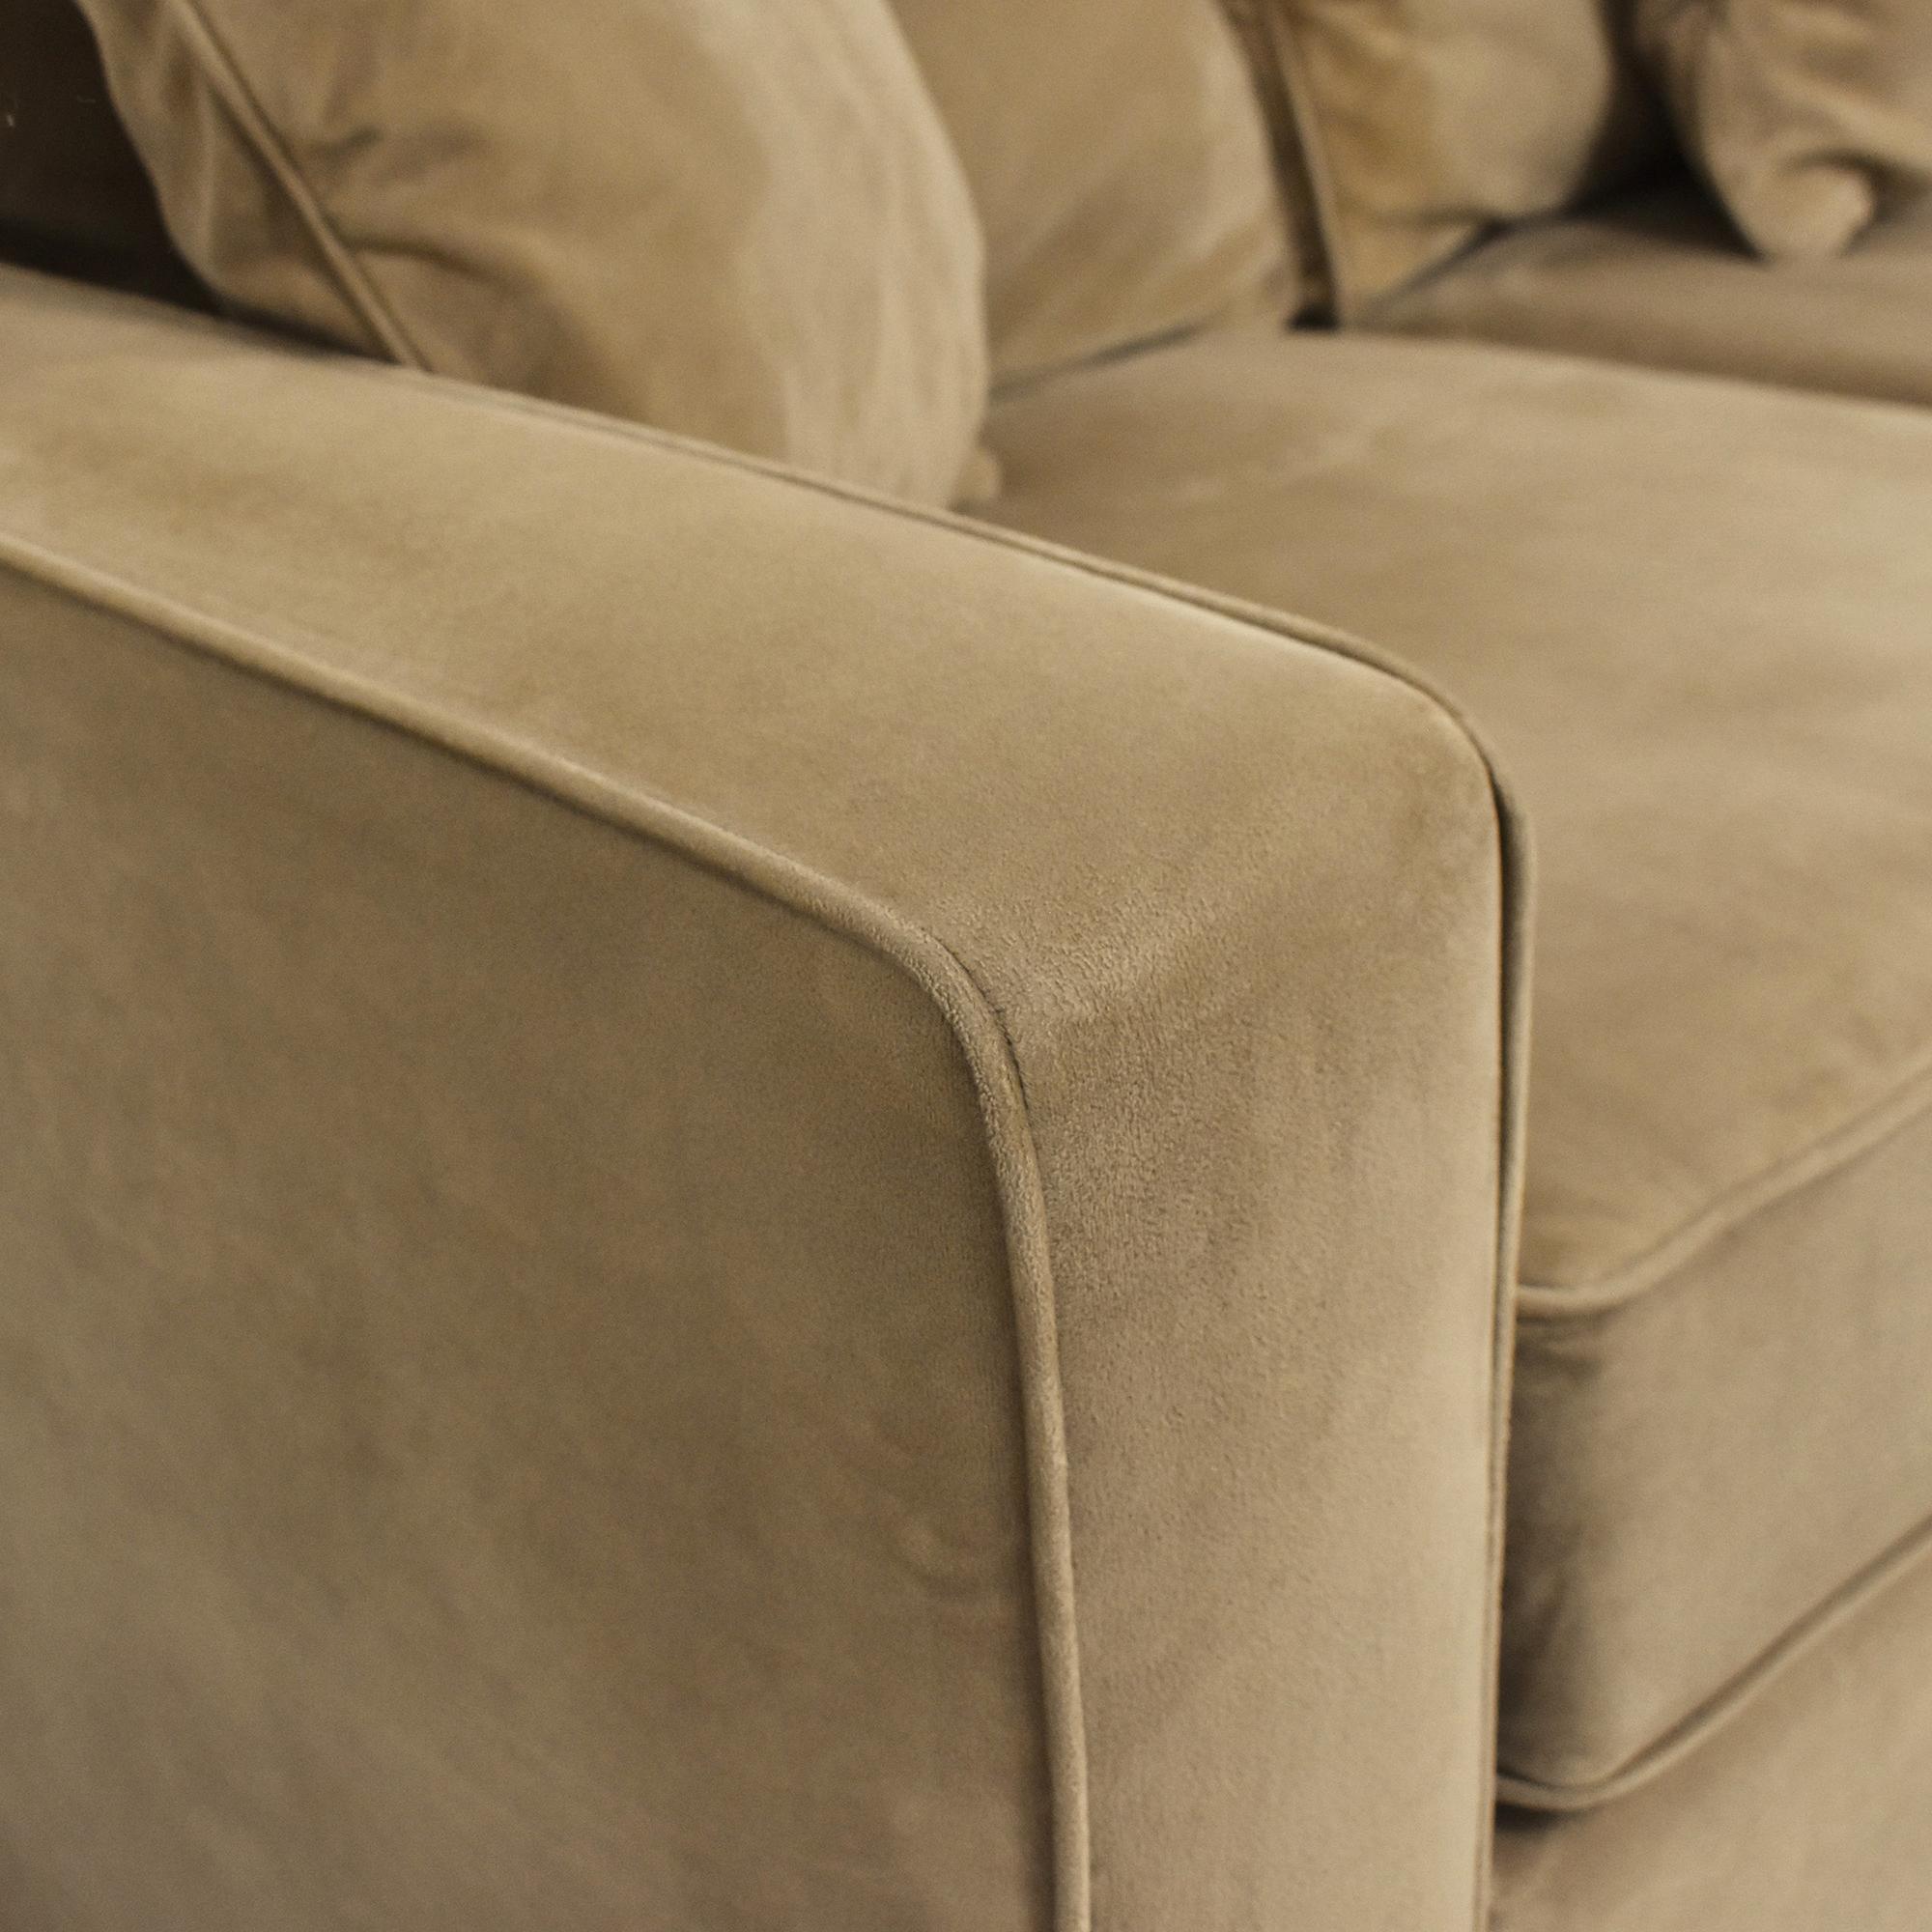 Macy's Macy's Jonathan Louis Corner Sectional Sofa tan